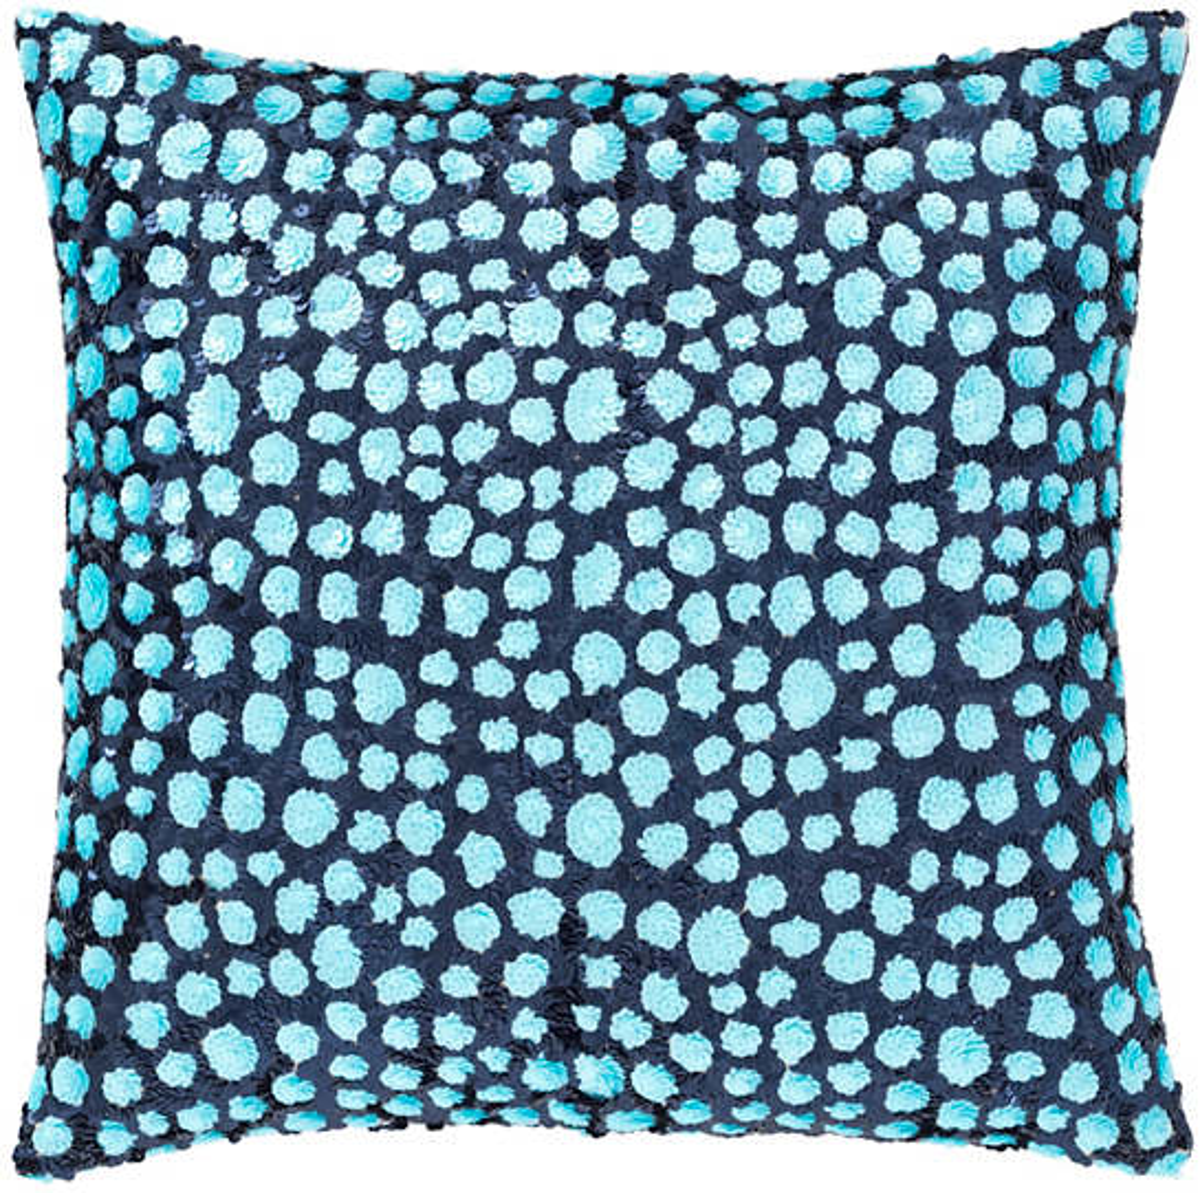 Grouper Navy/Turquoise Decorative Pillow